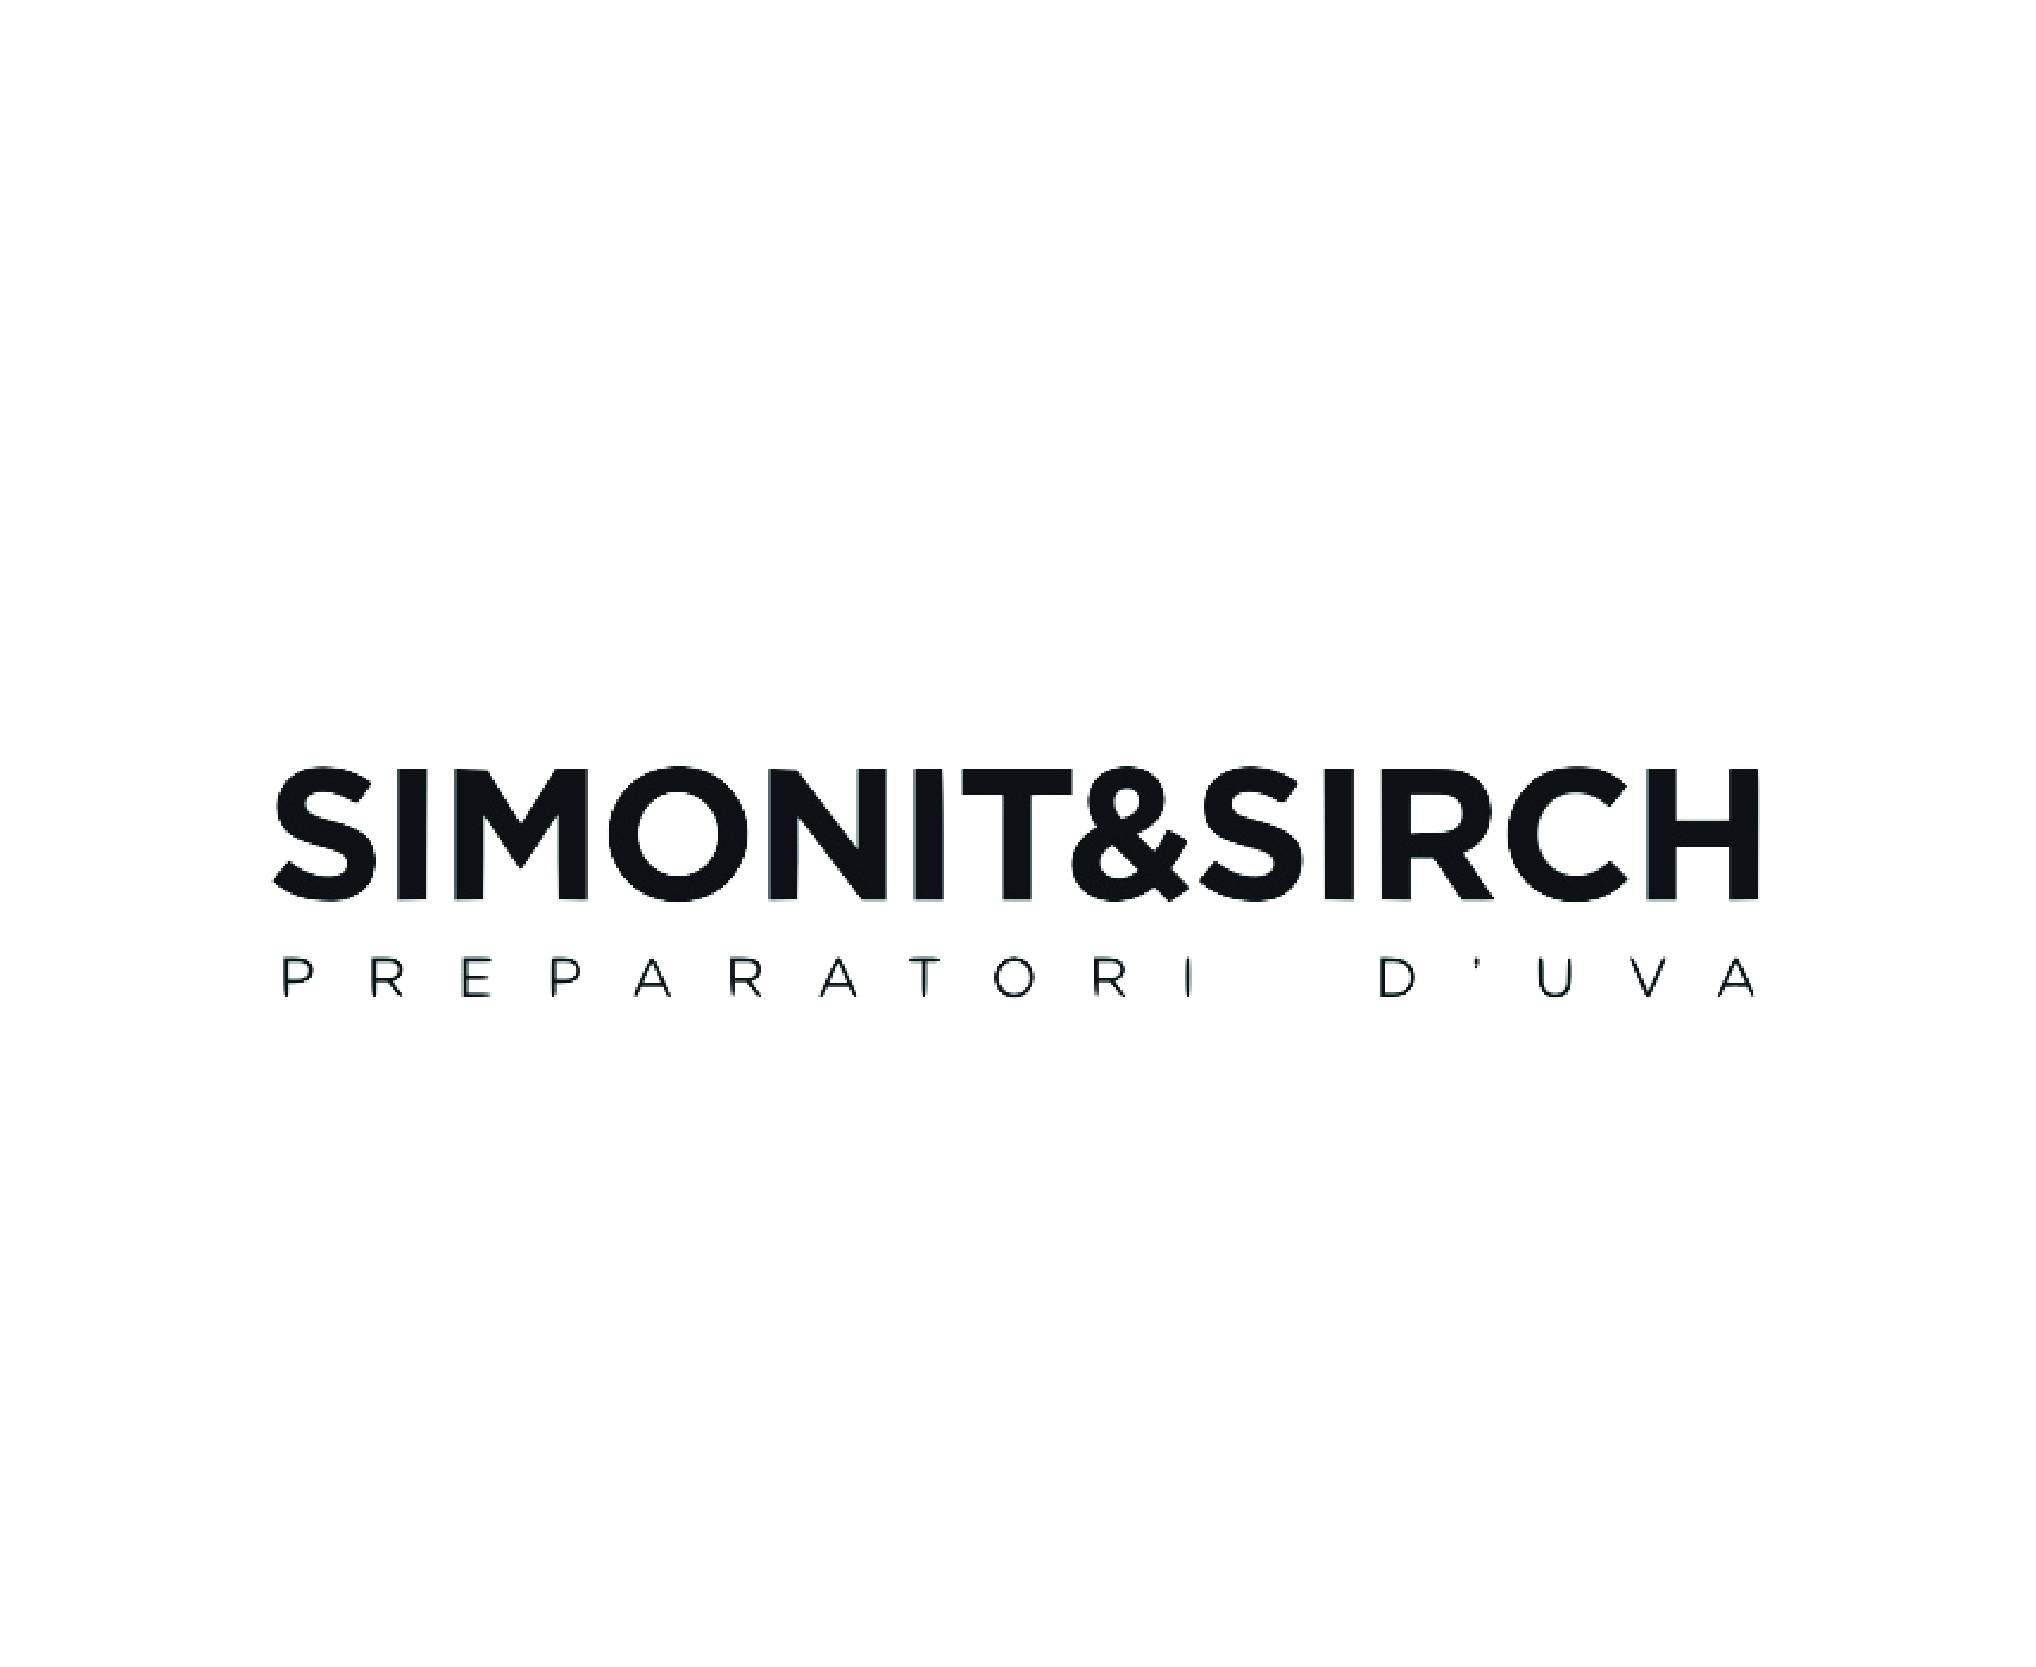 Simonit&Sirch